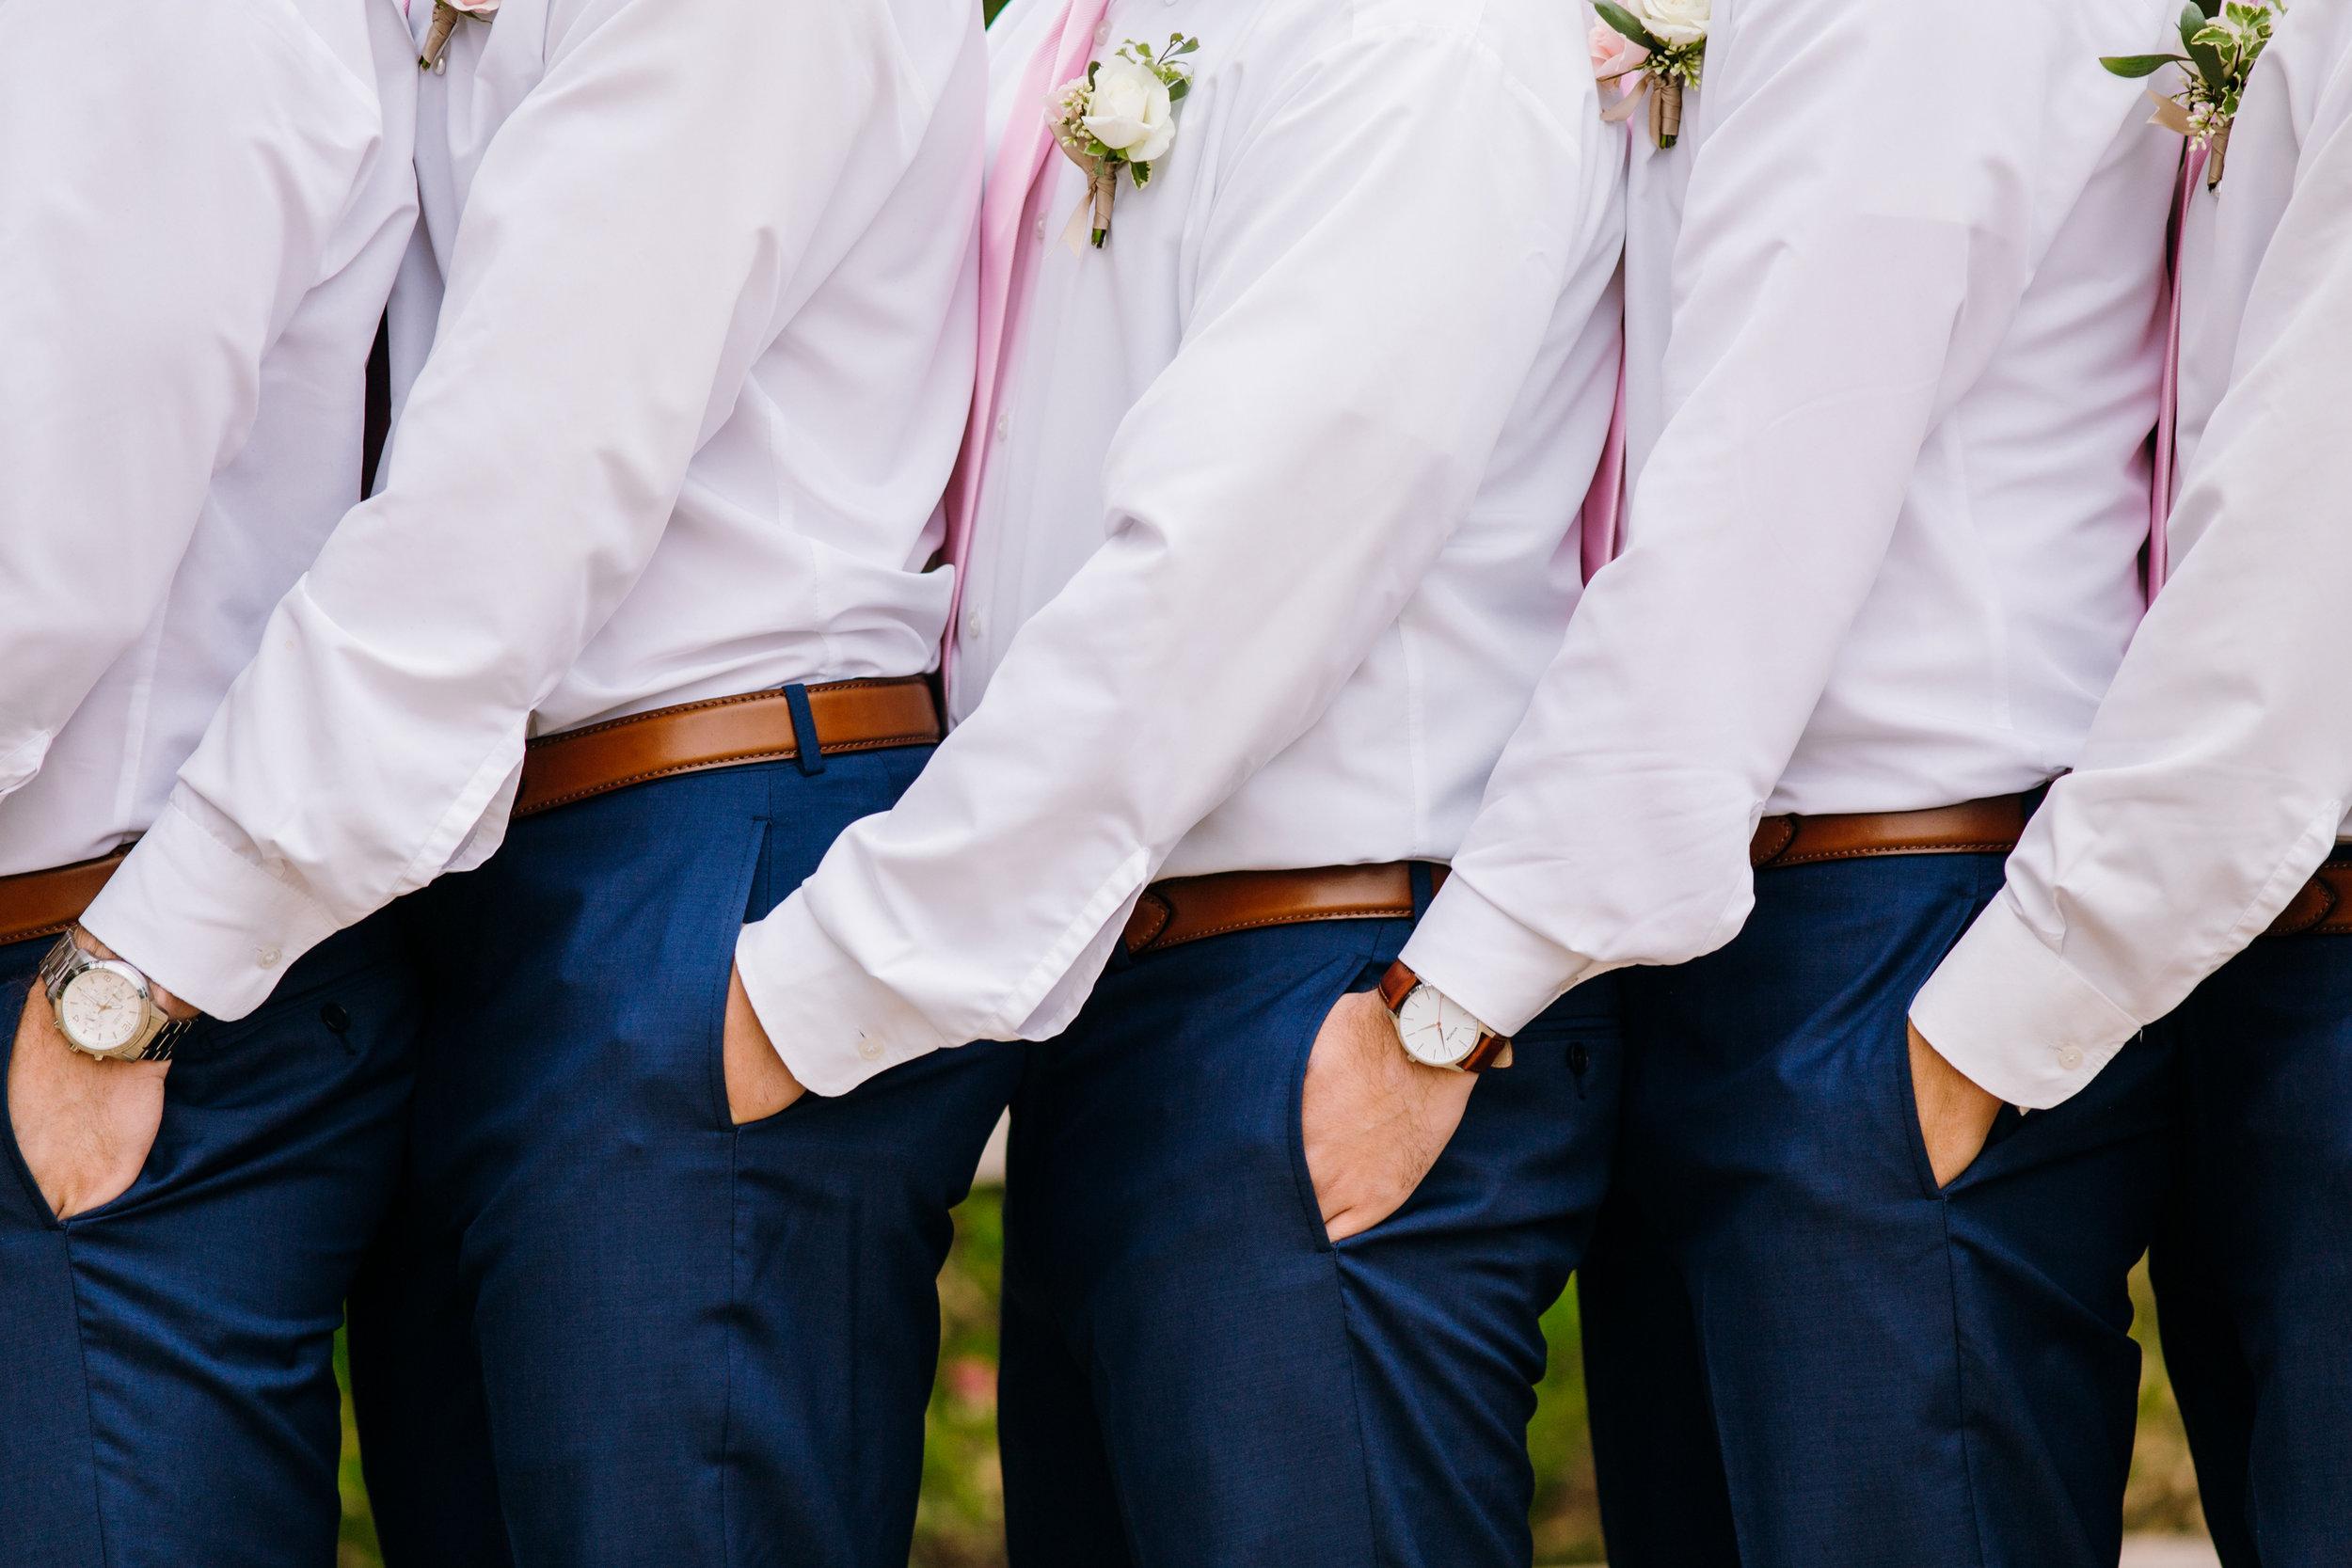 KaraNixonWeddings-LakeOakMeadows-Temecula-Wedding-19.jpg